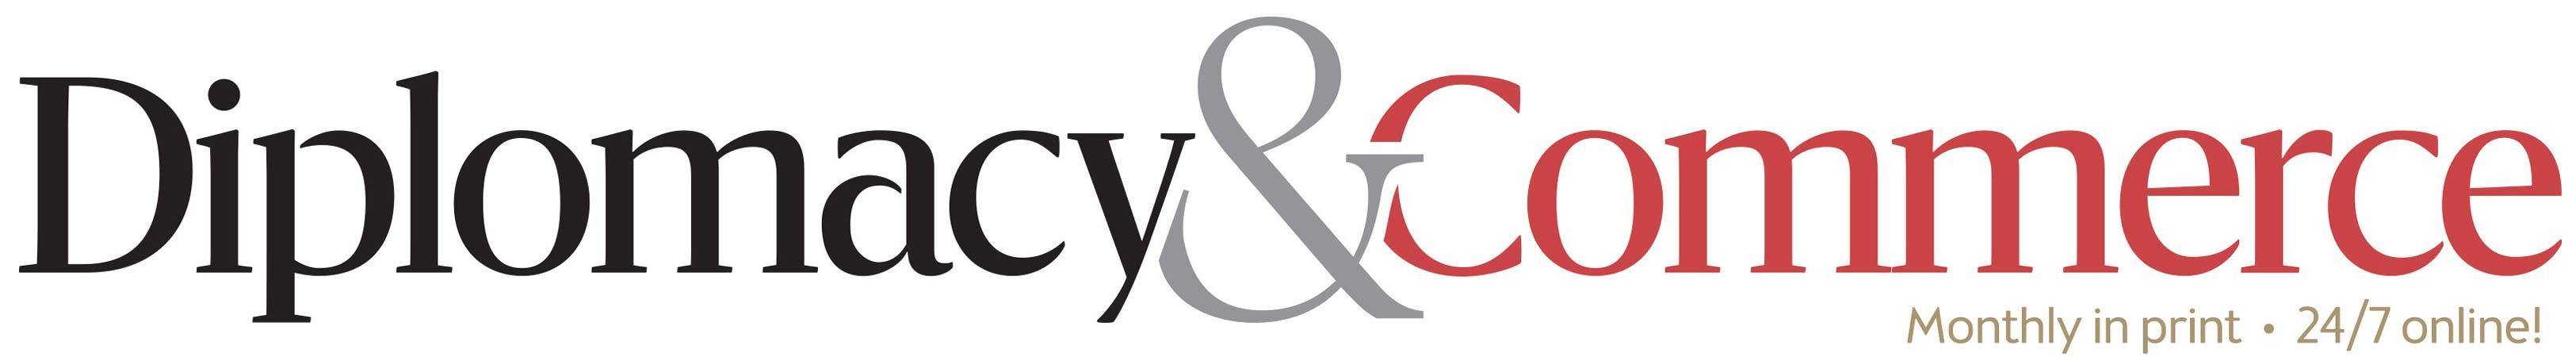 Diplomacy&Commerce Austria